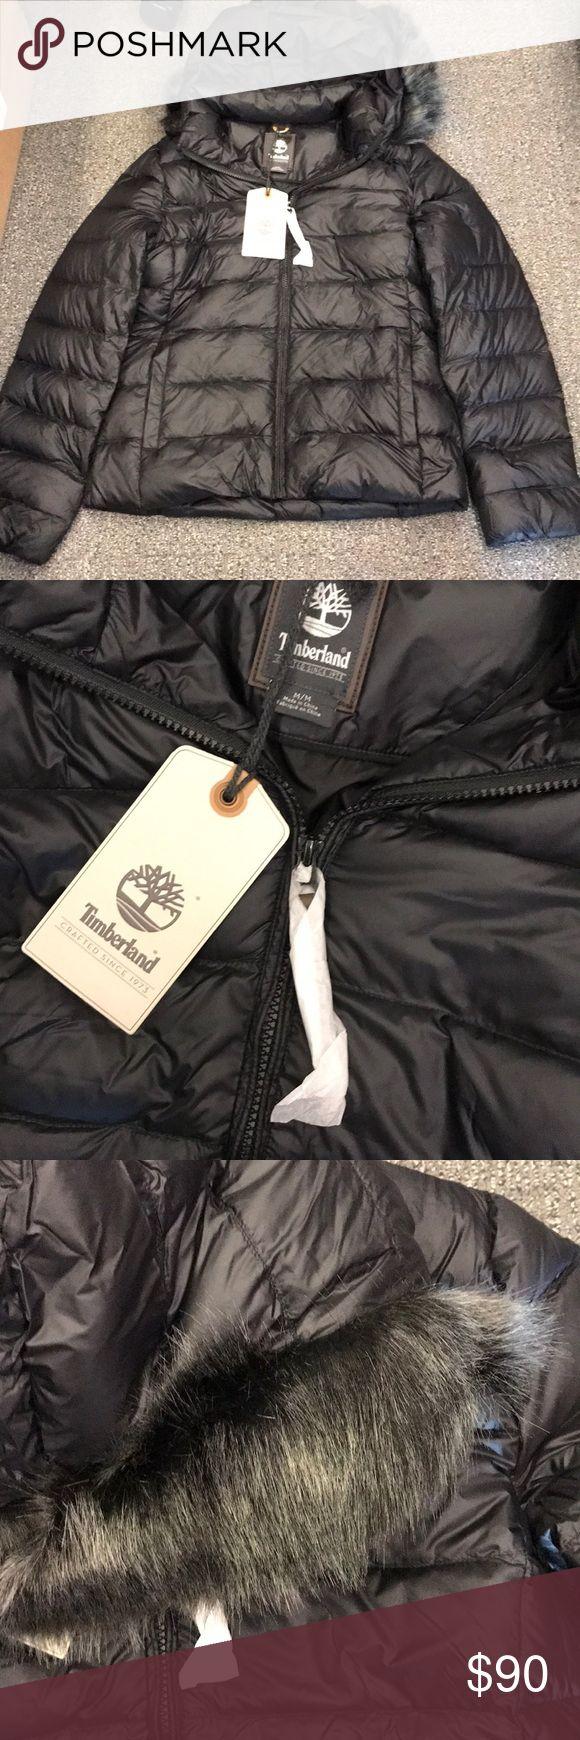 Timberland jacket Black Timberland Madison down jacket. Removable fur hood. Never worn! Tags still on. Timberland Jackets & Coats Puffers